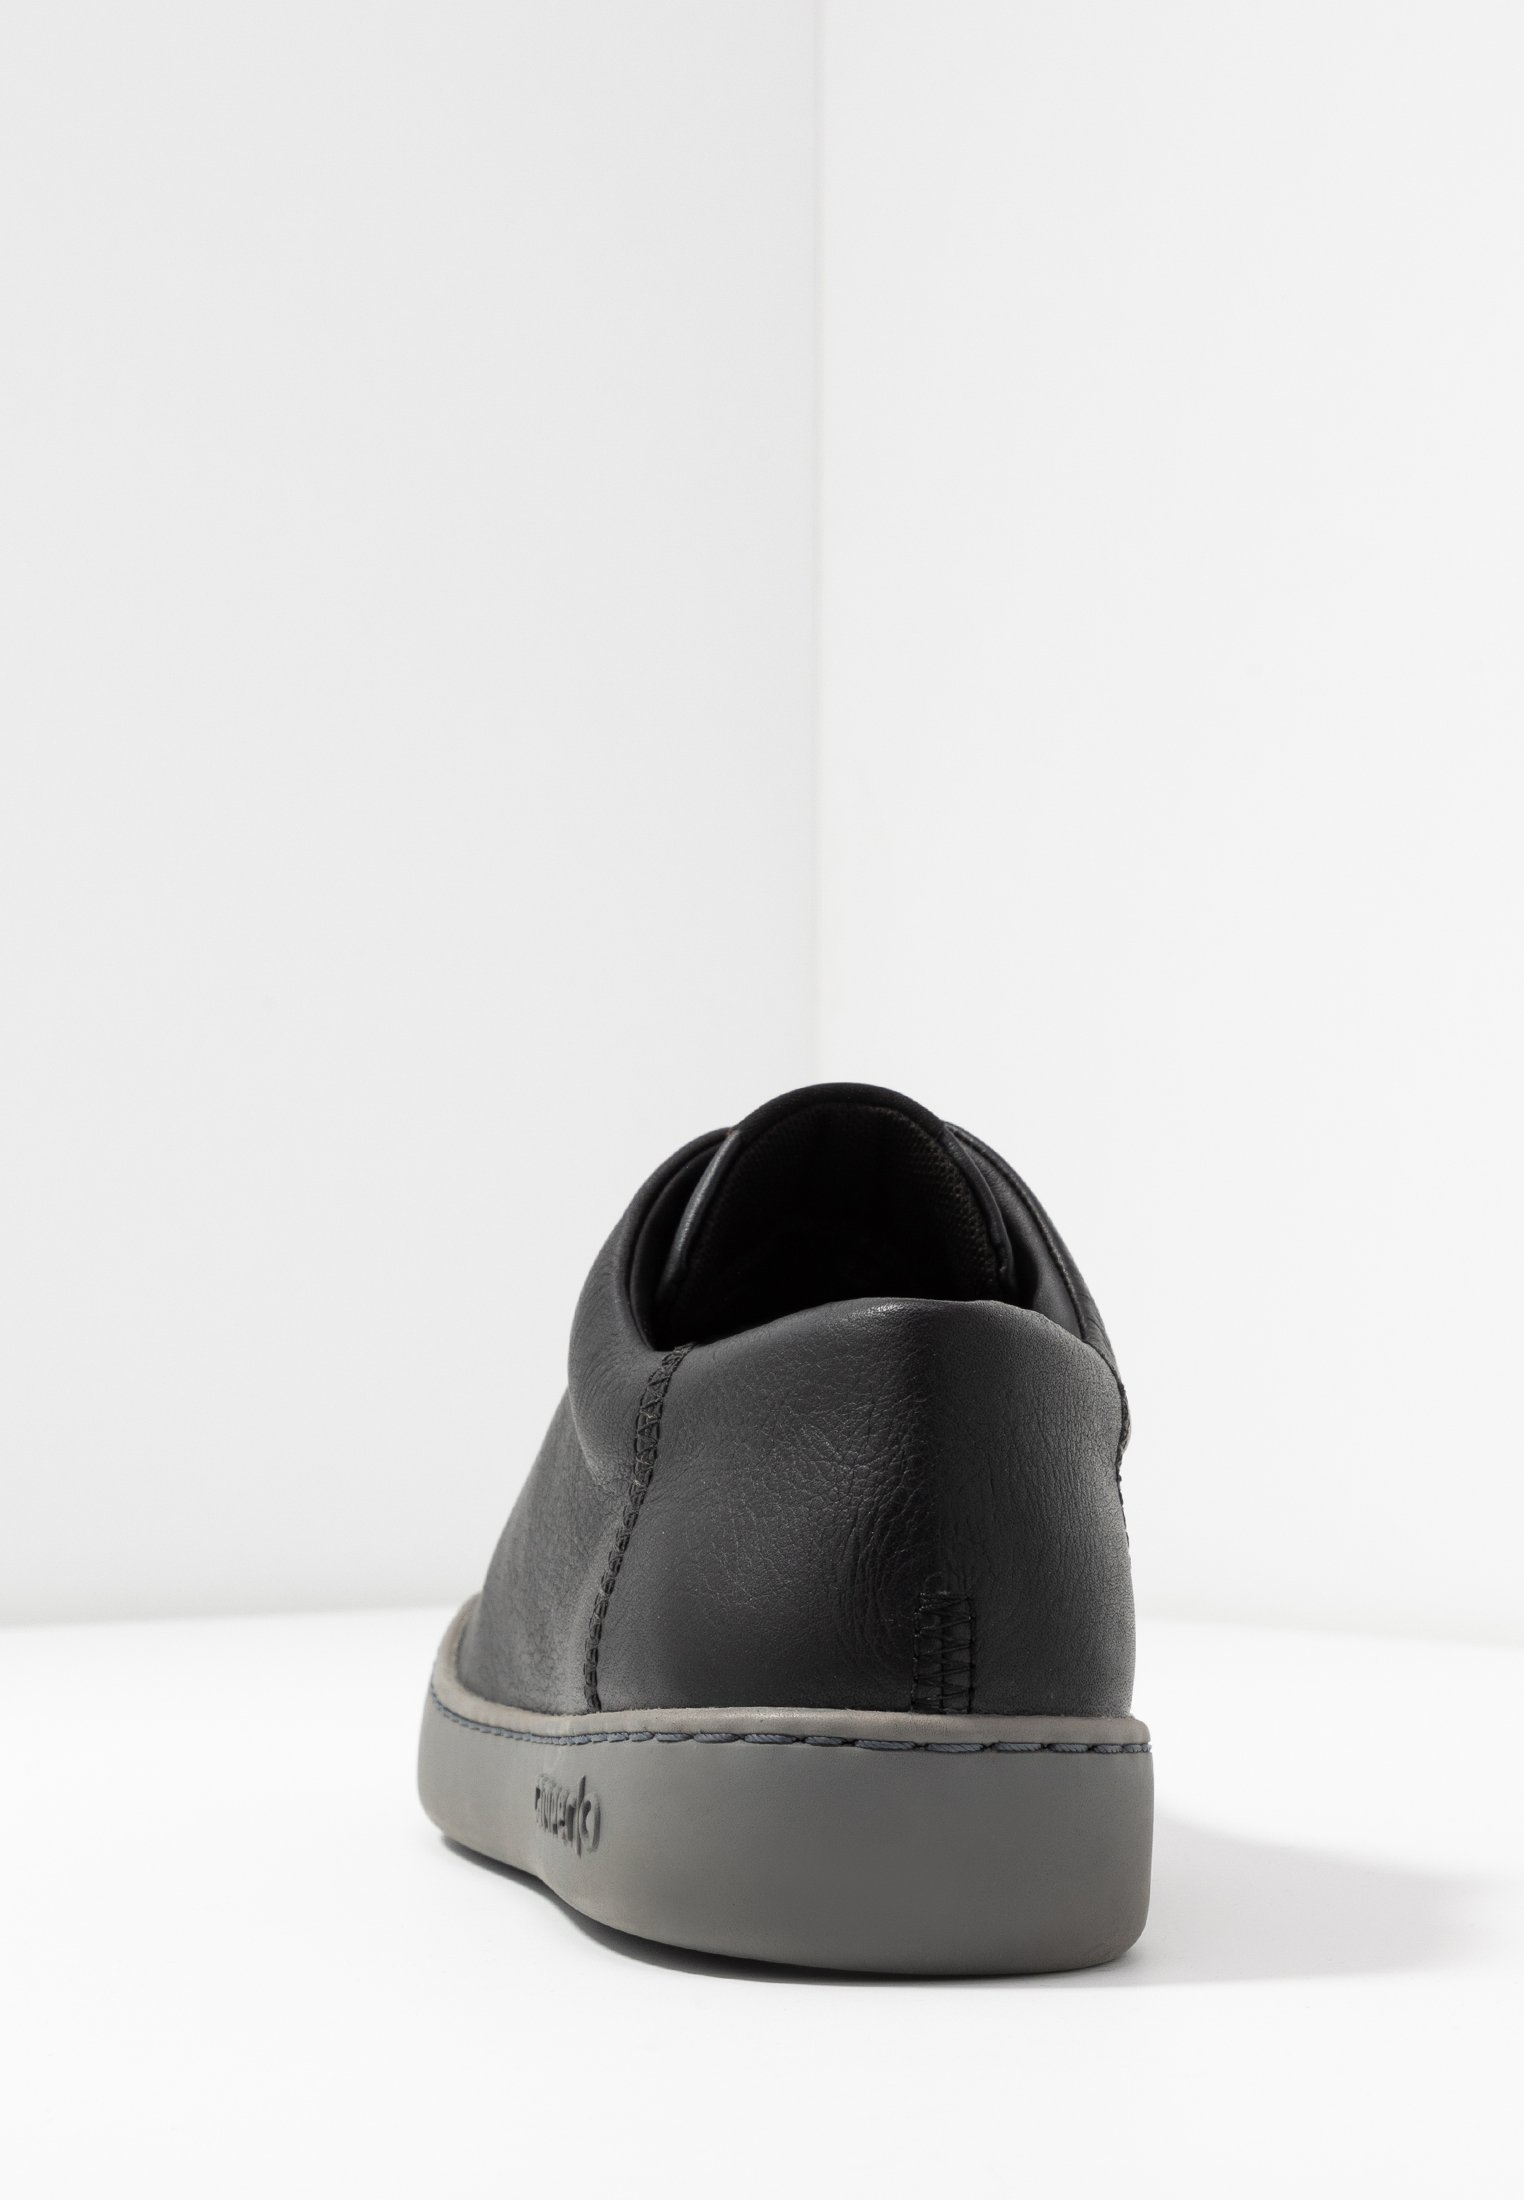 Camper Peu Touring - Loafers Black